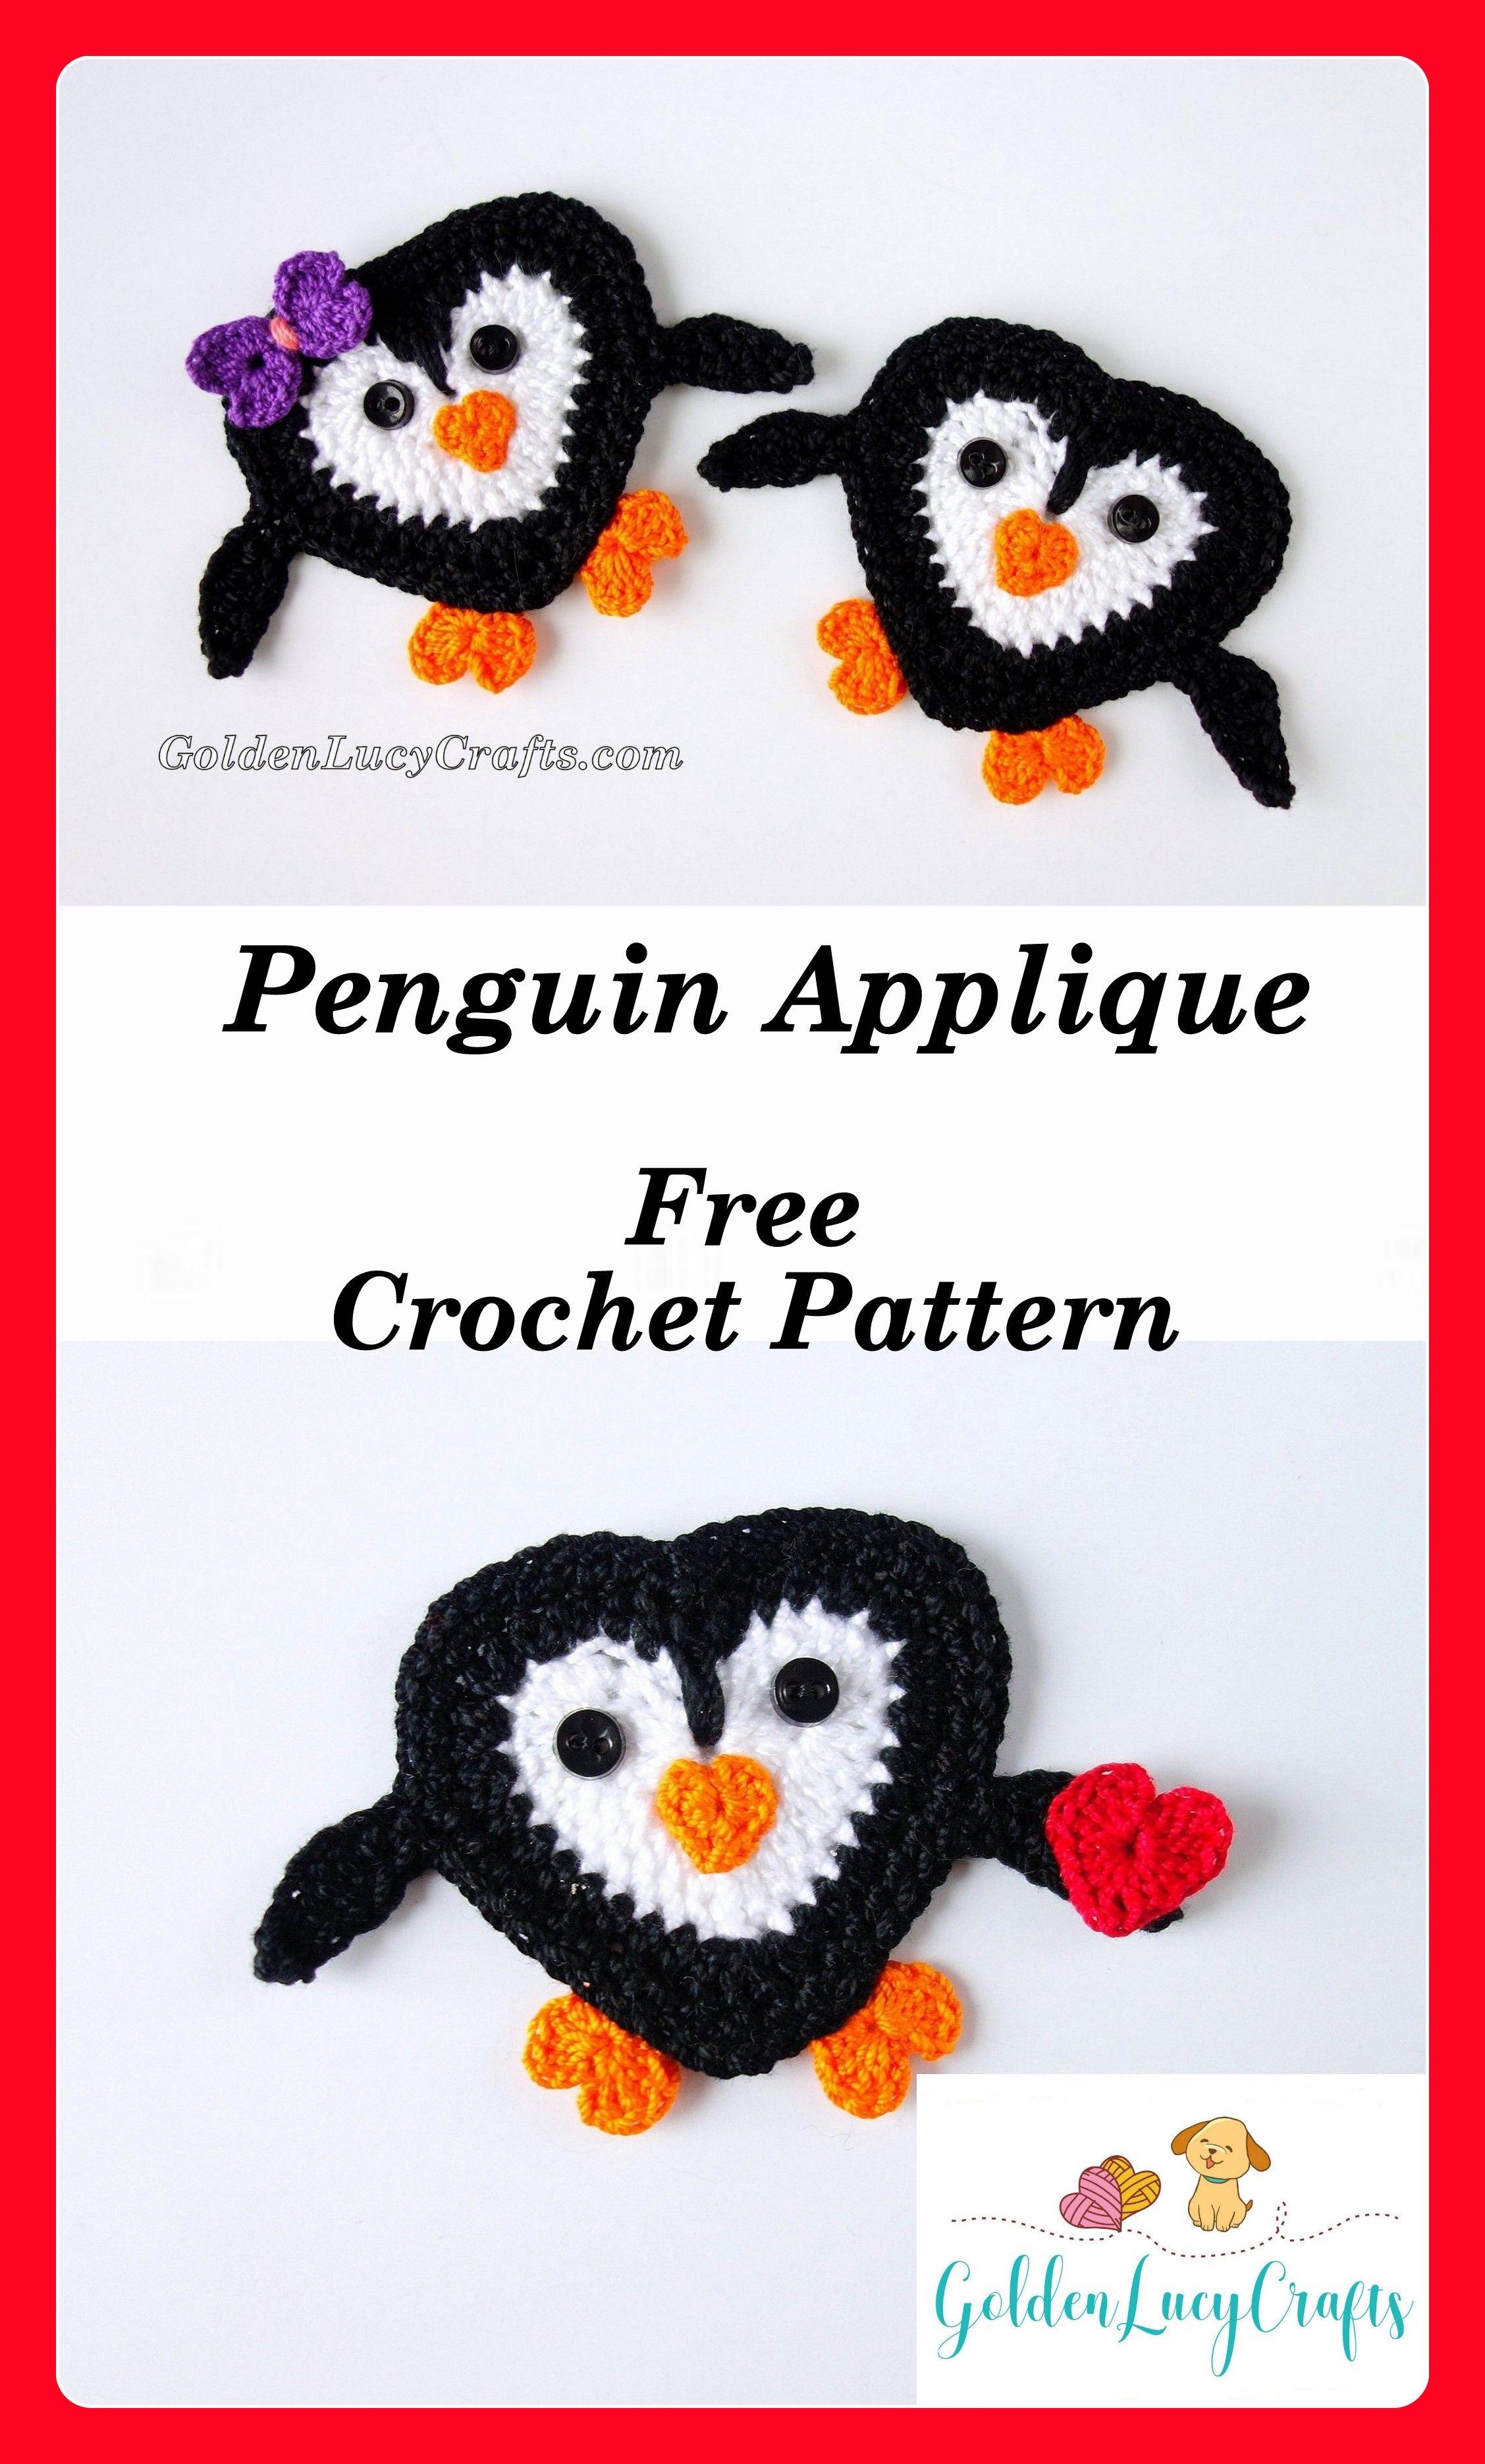 Penguin Applique, free crochet pattern - GoldenLucyCrafts | Free ...